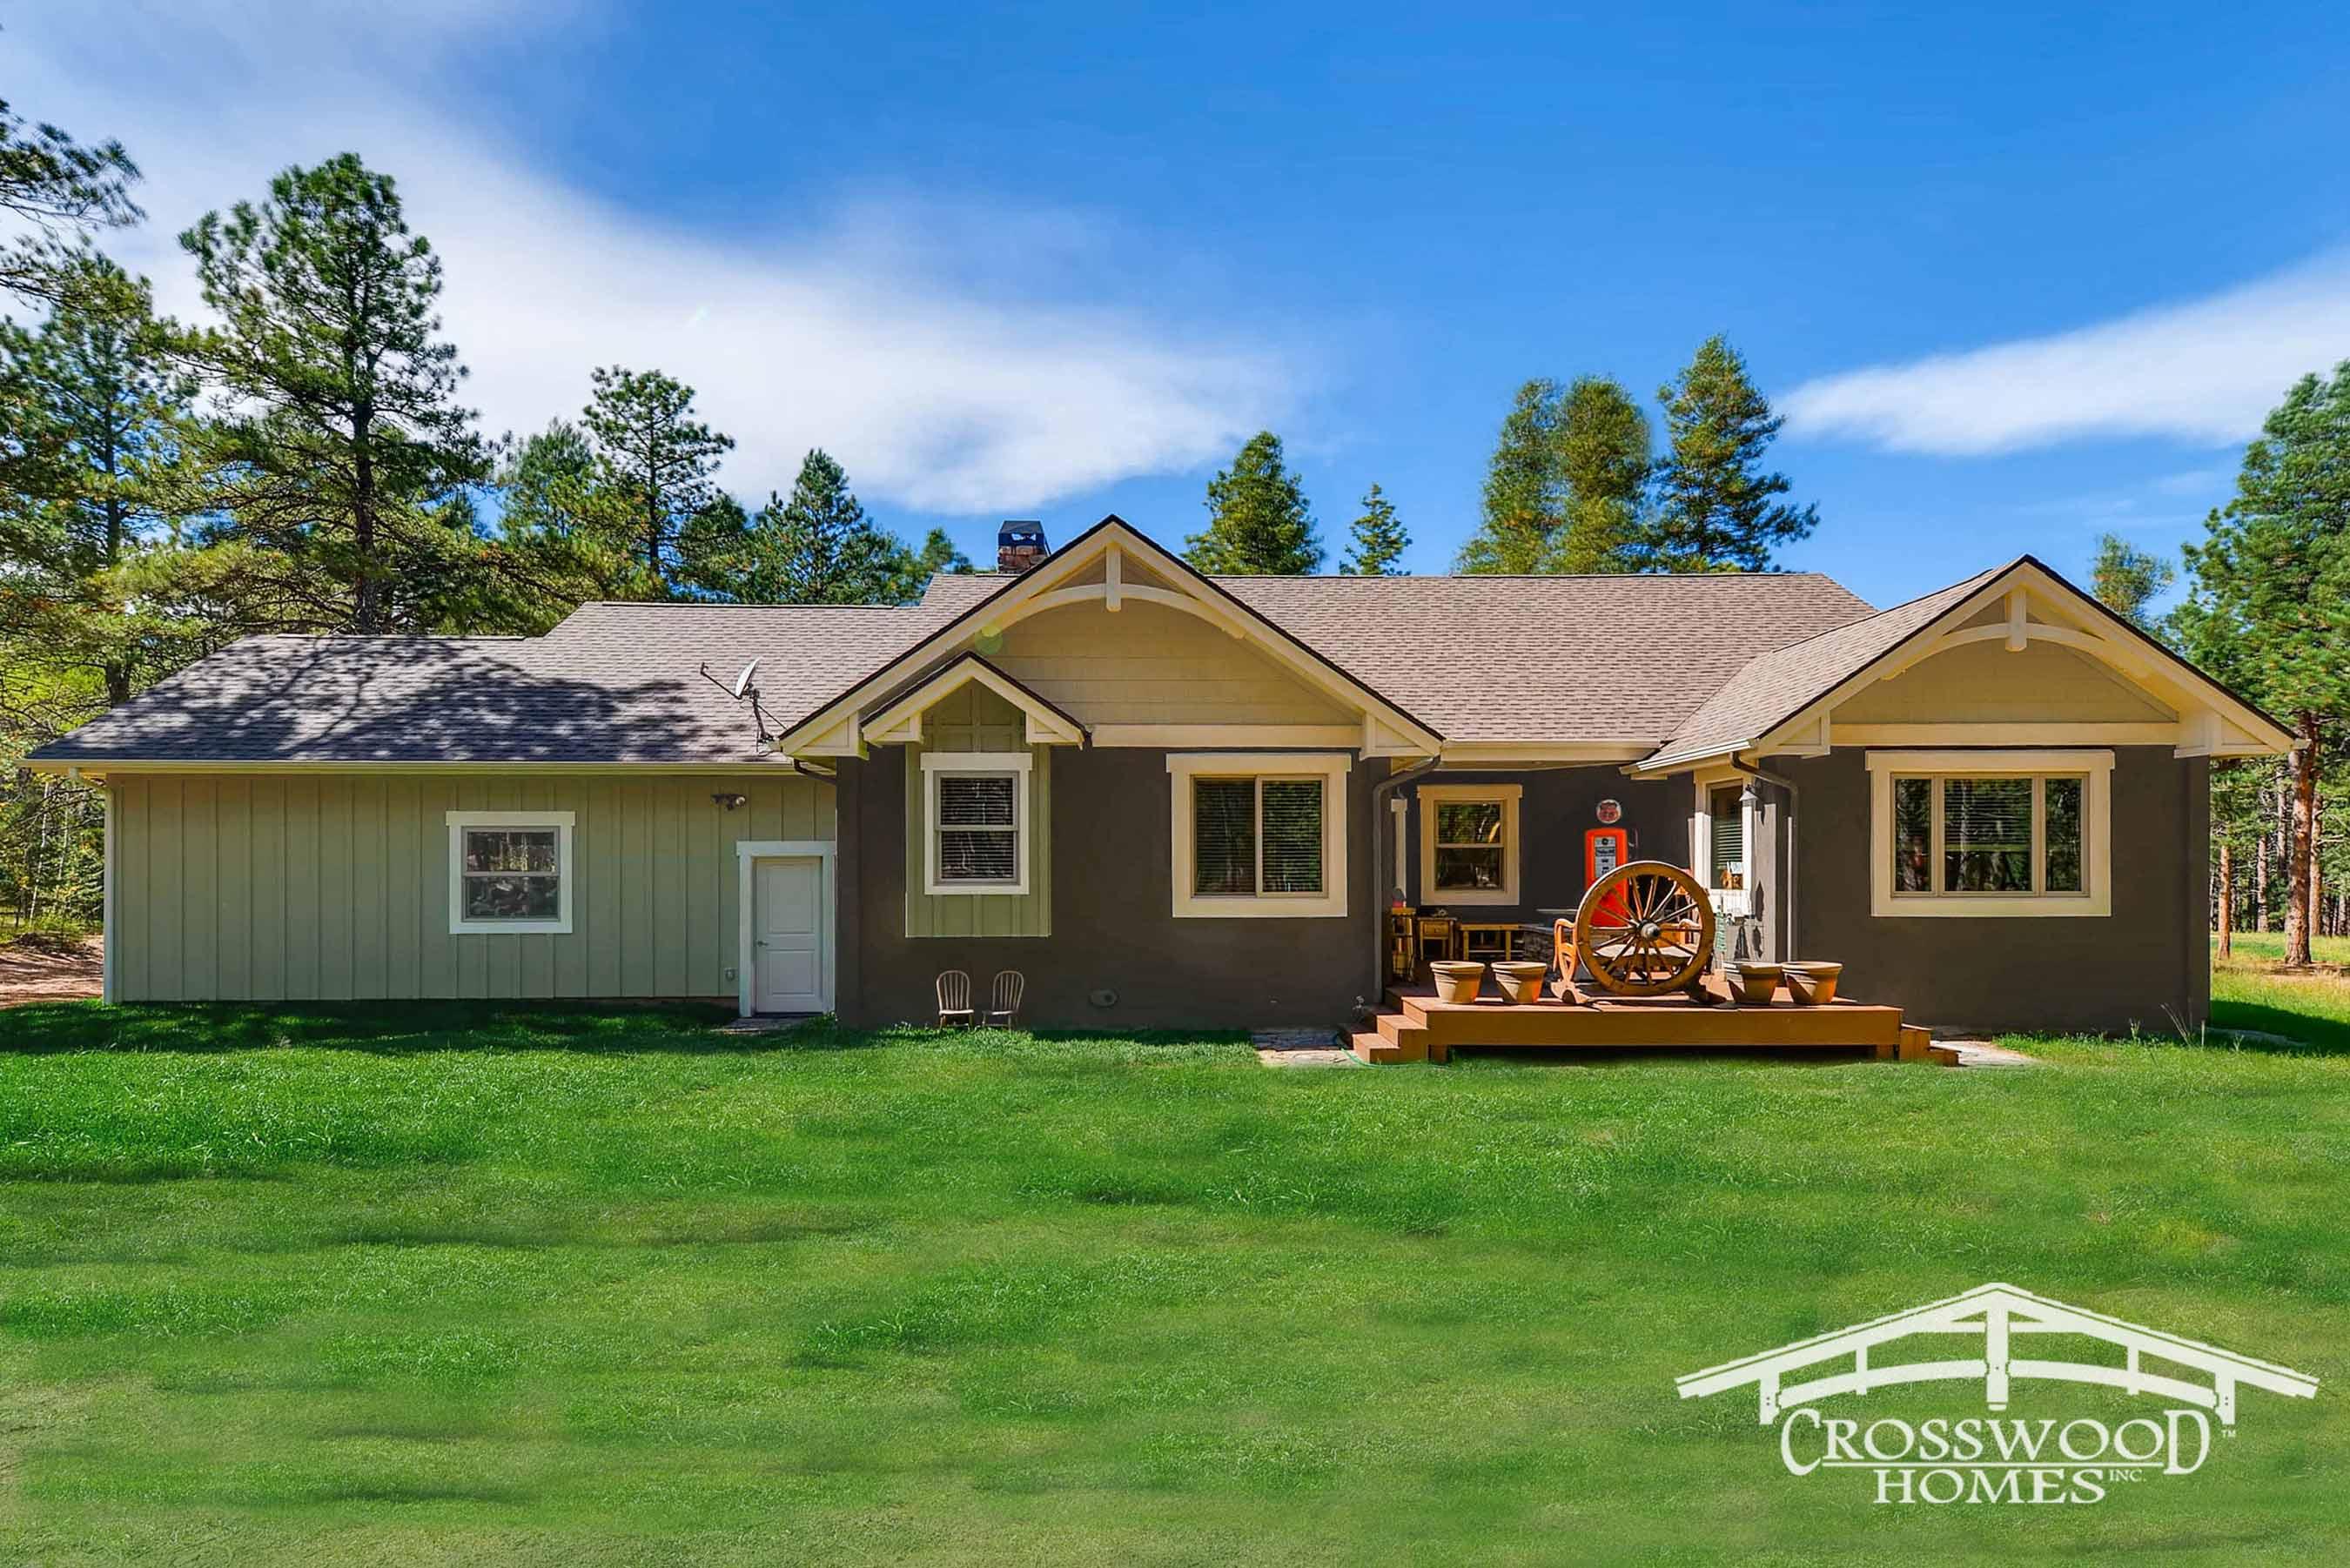 Crosswood Homes Custom Mountain Home